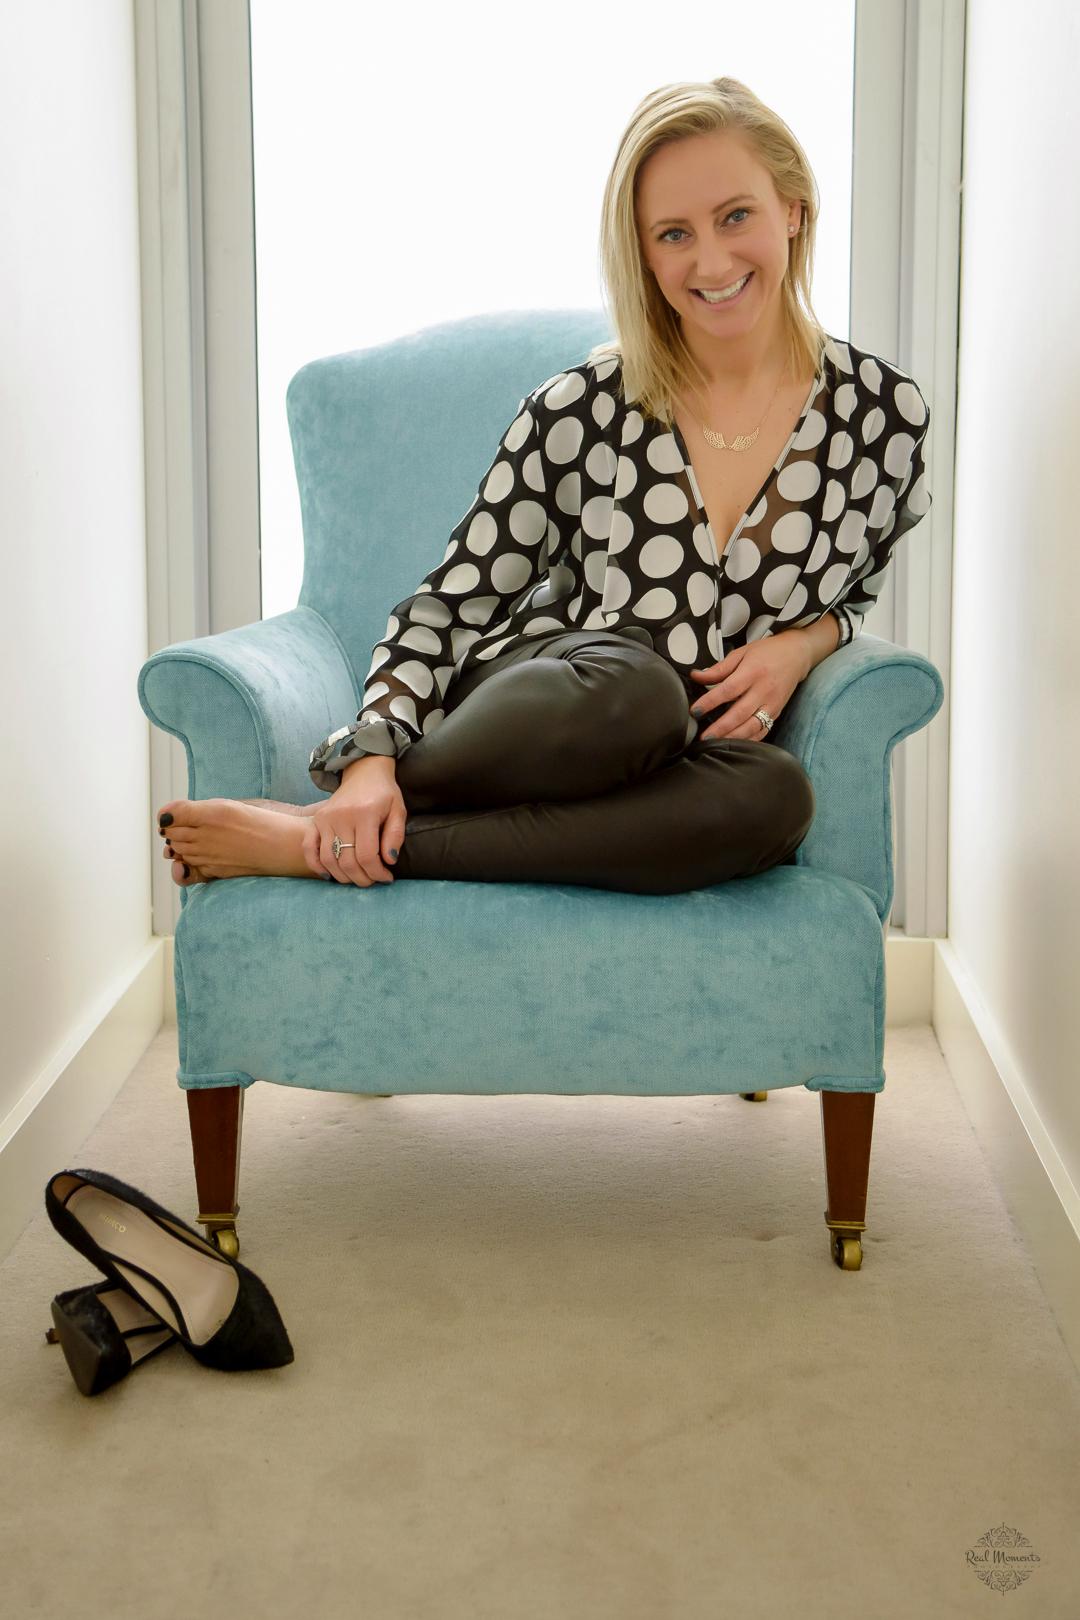 A corporate photography portrait of Sarah Irwin of Jeunesse